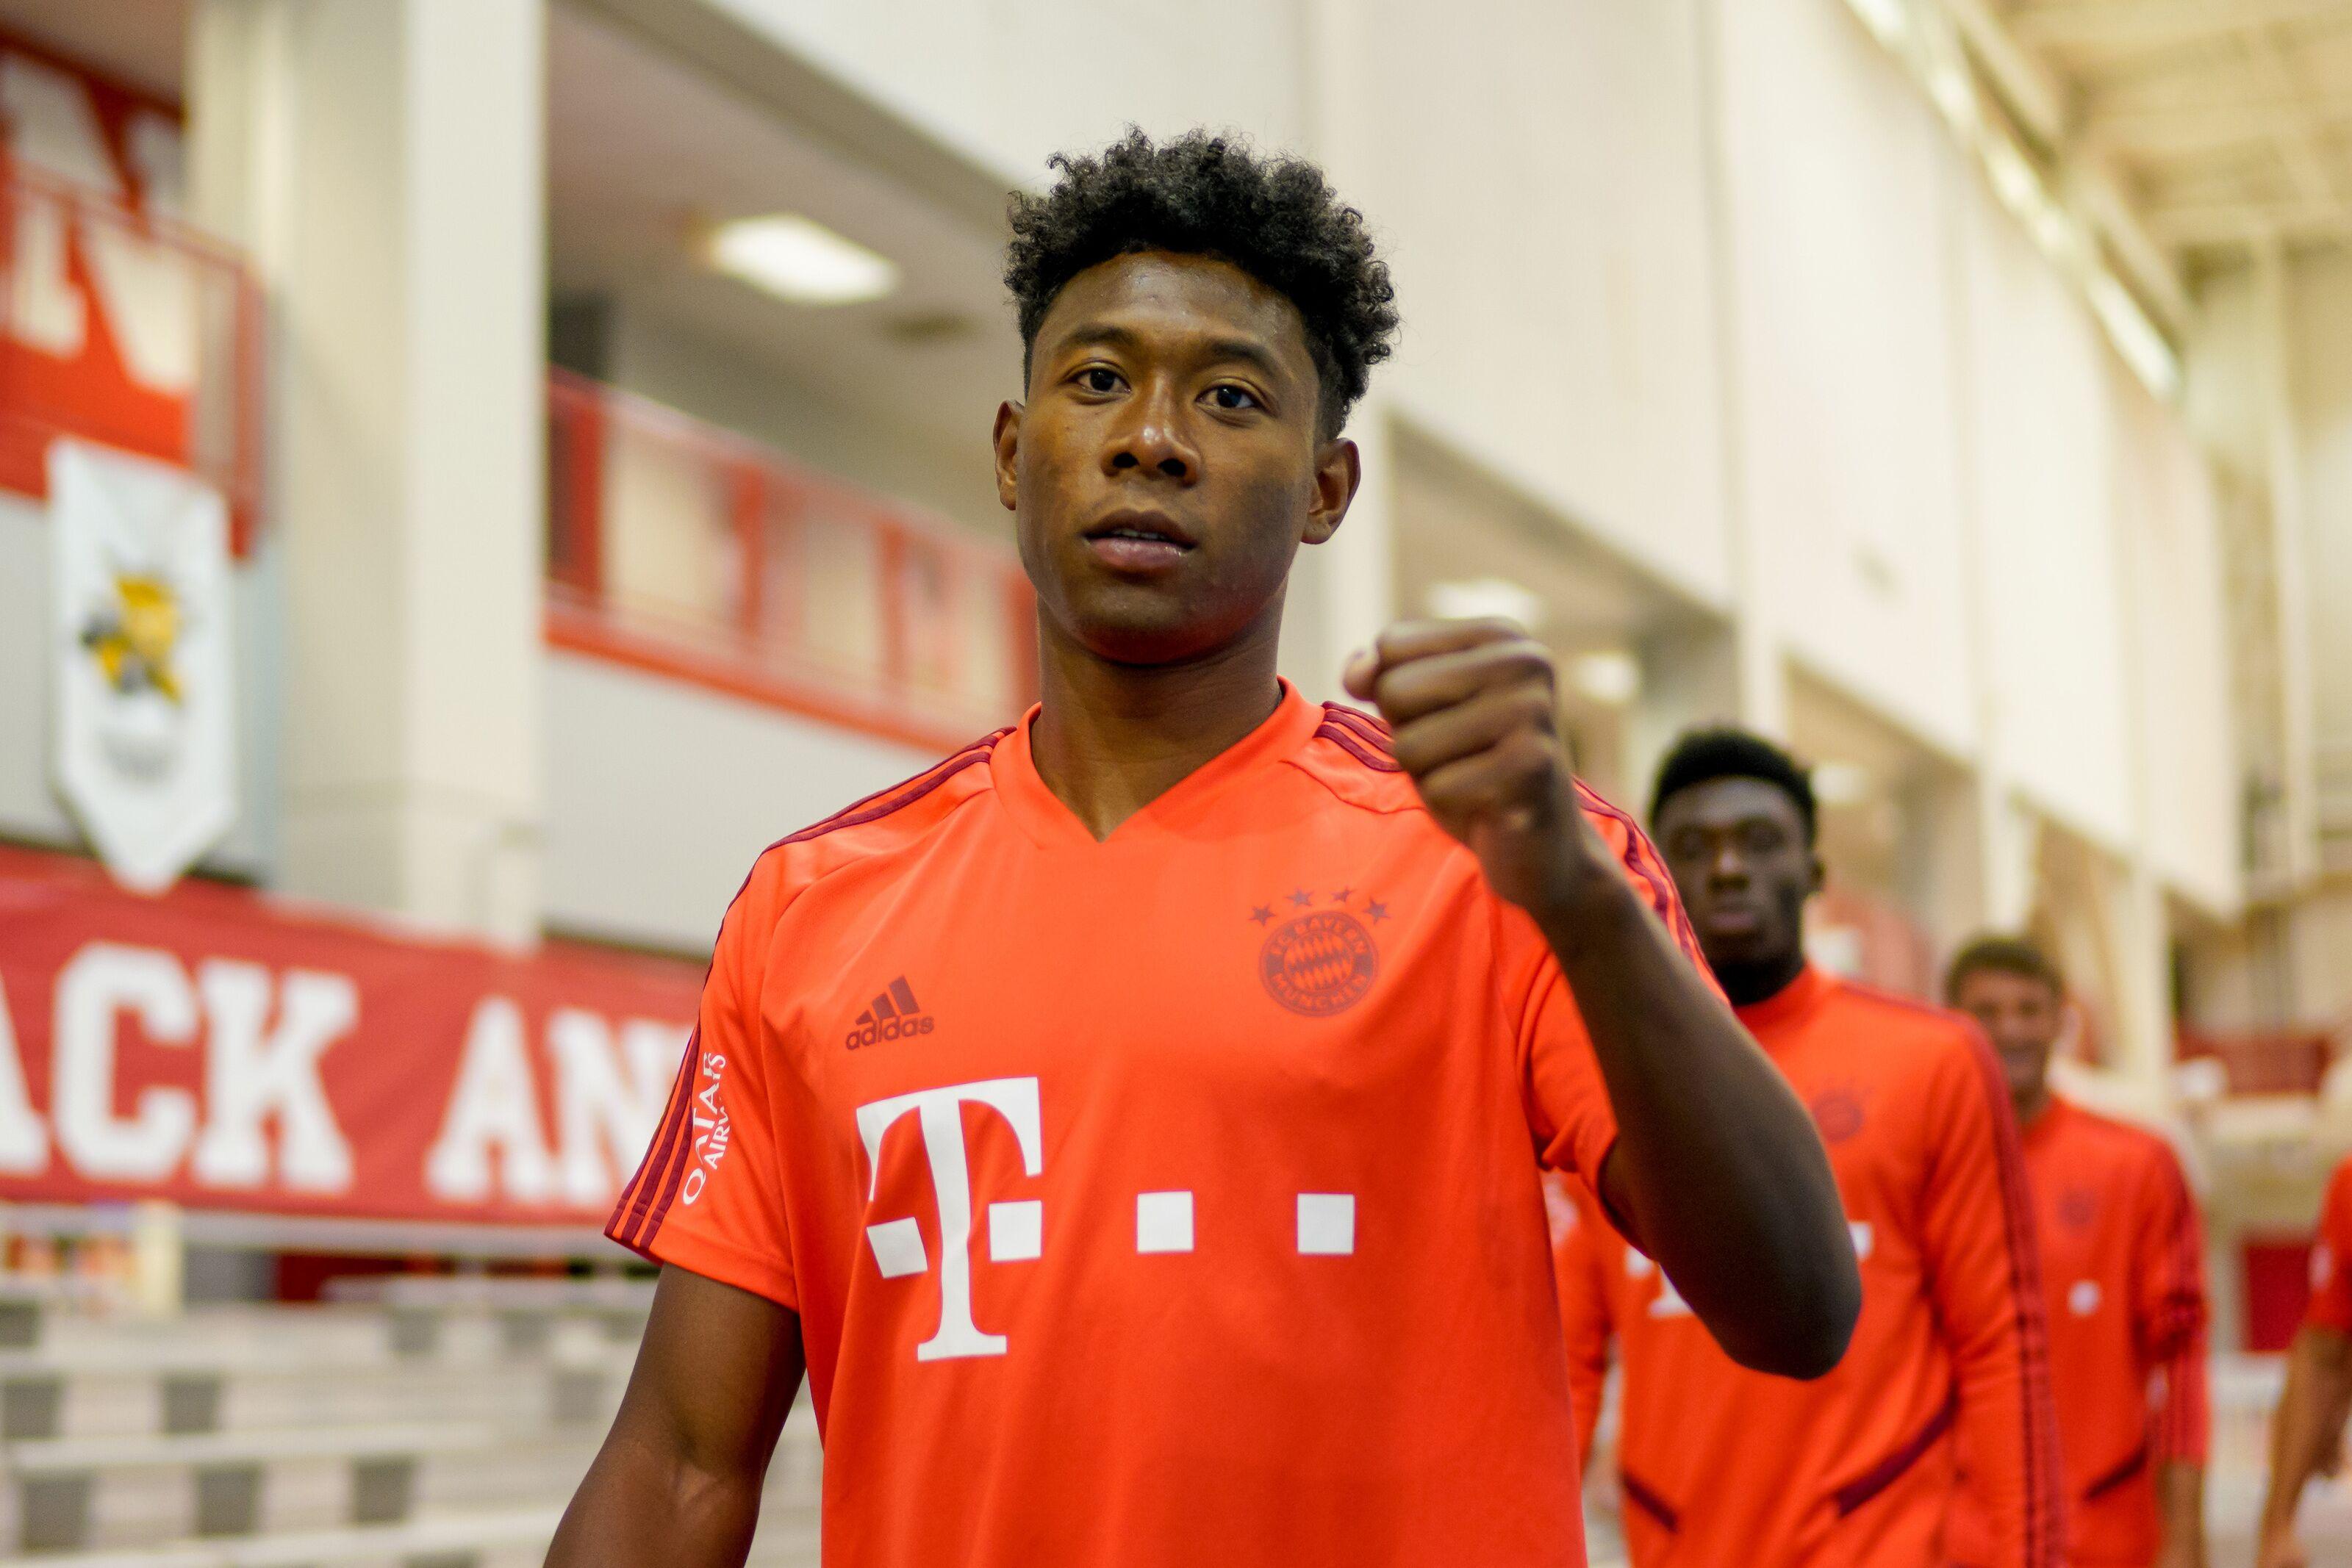 Bayern Munich have no plans to sell David Alaba this summer